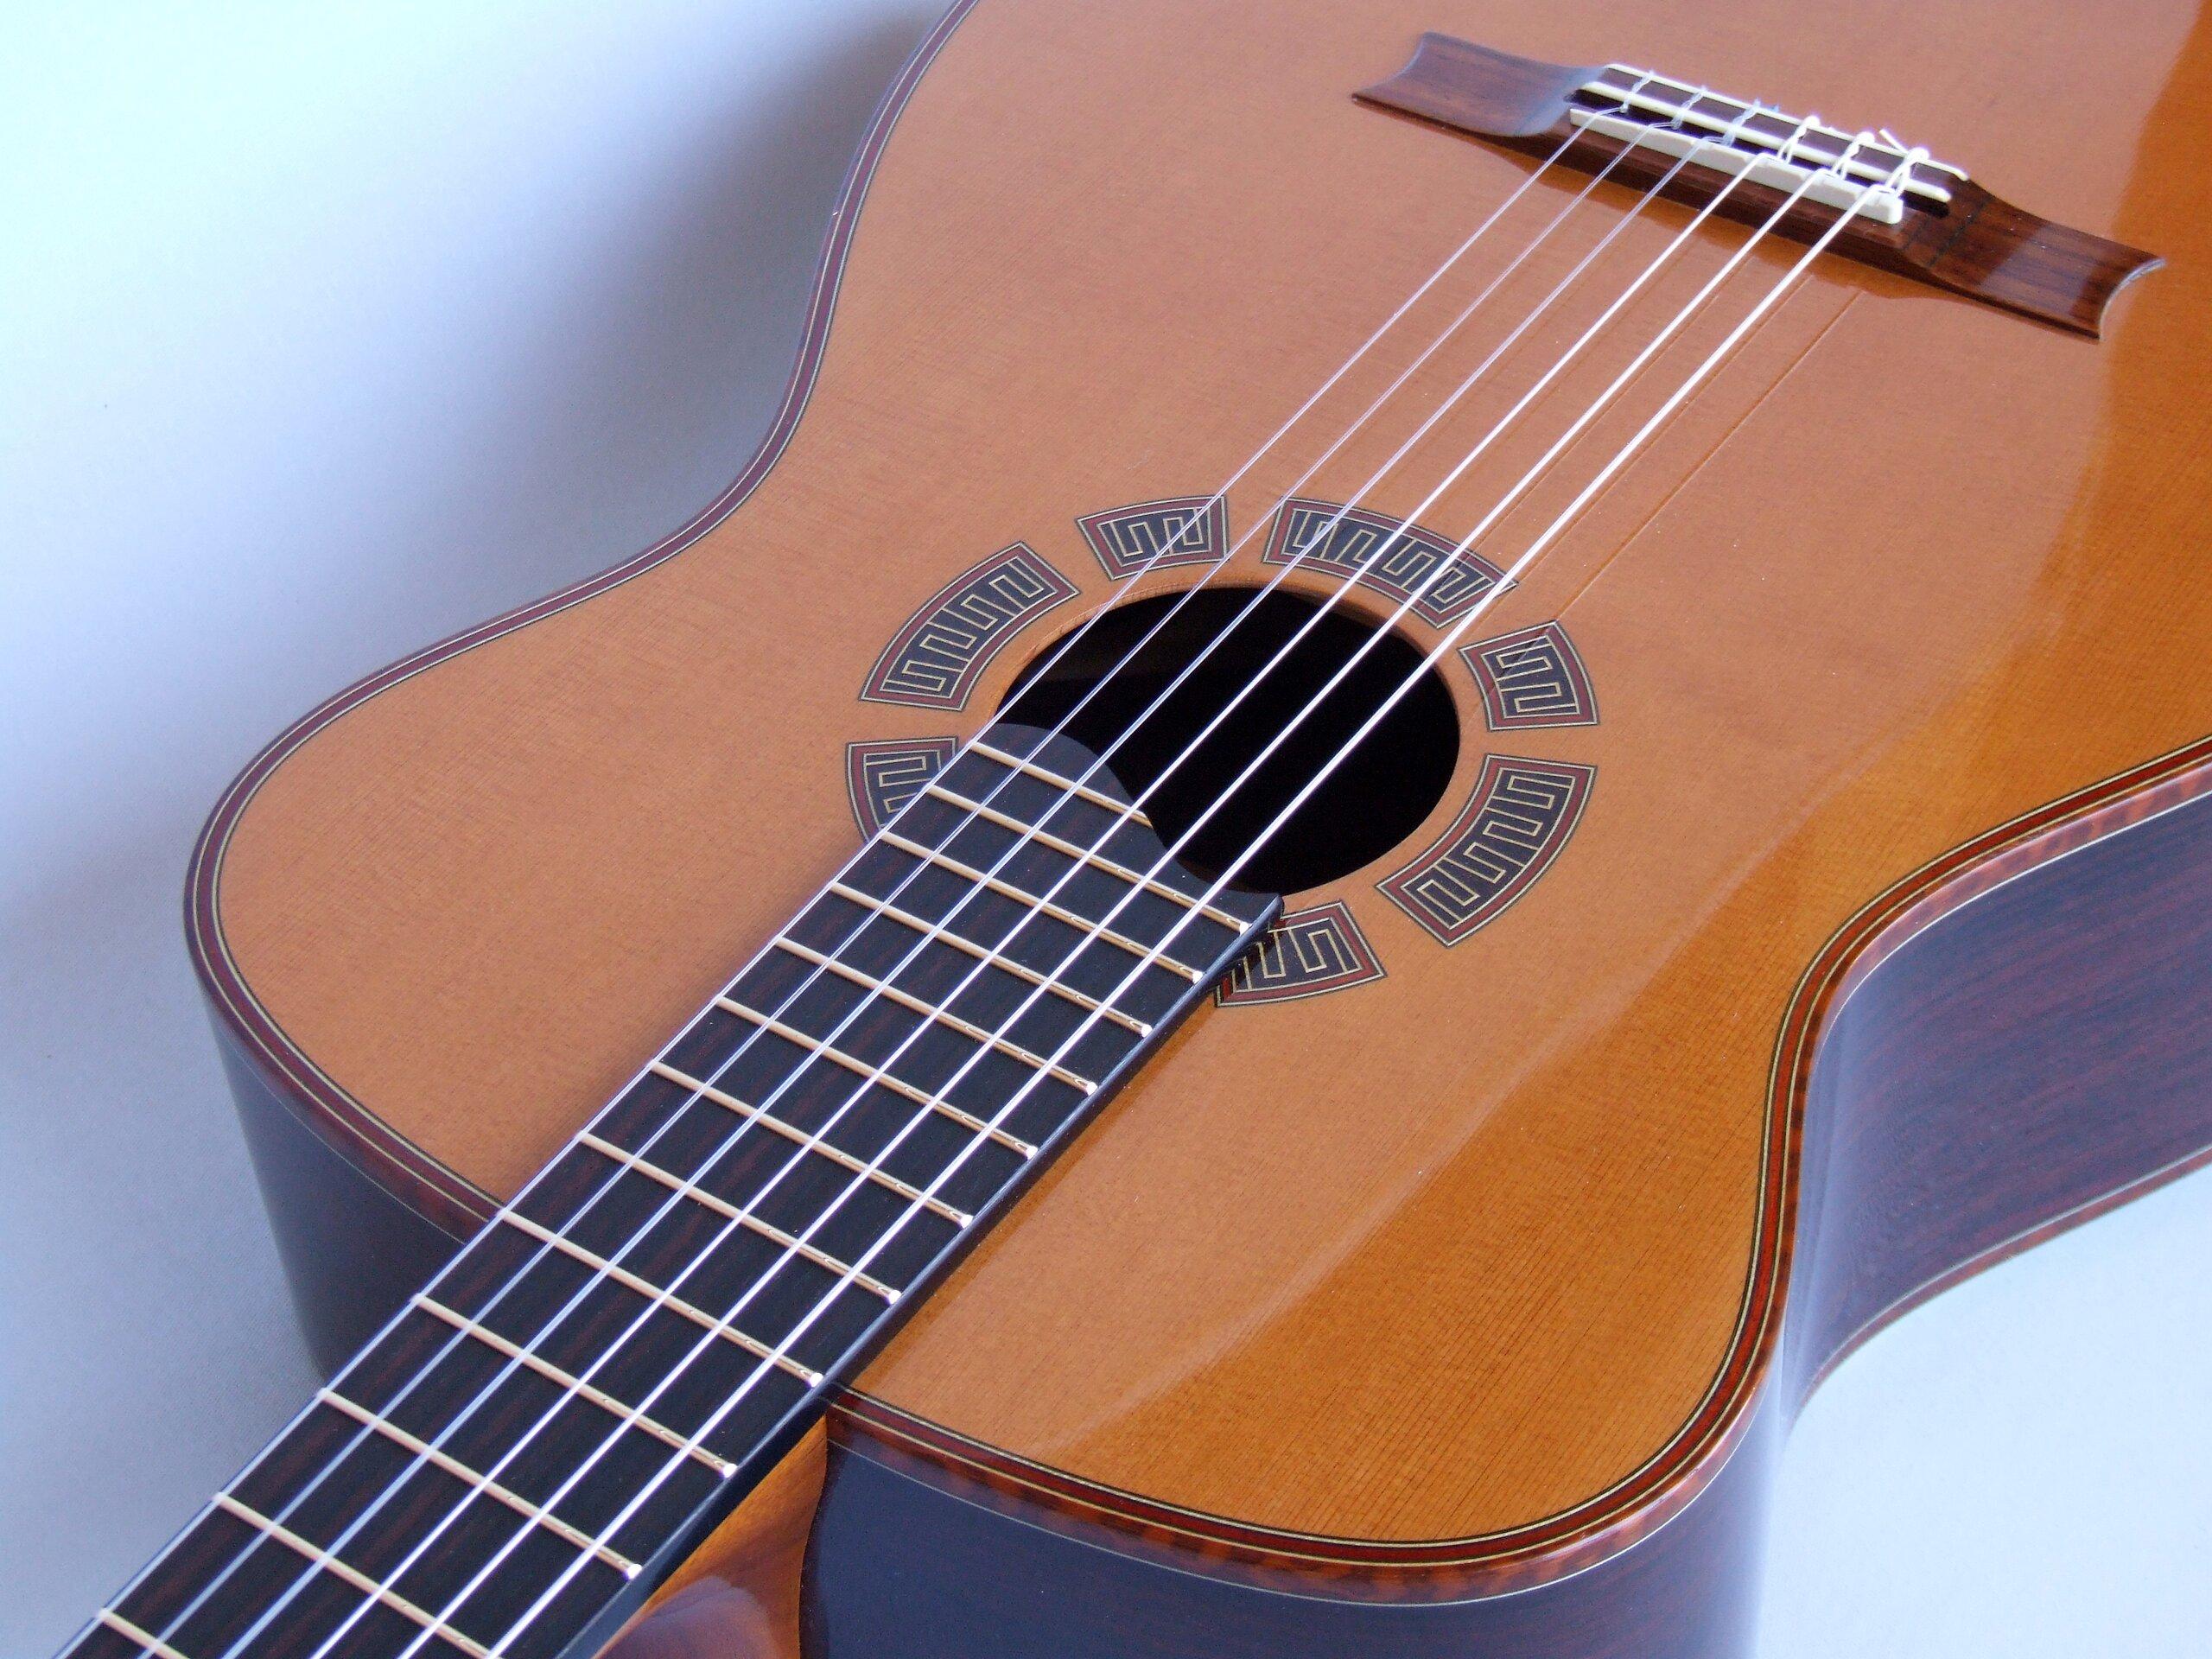 Cedar top classcial guitar with segmented rosette and snakewood bindings